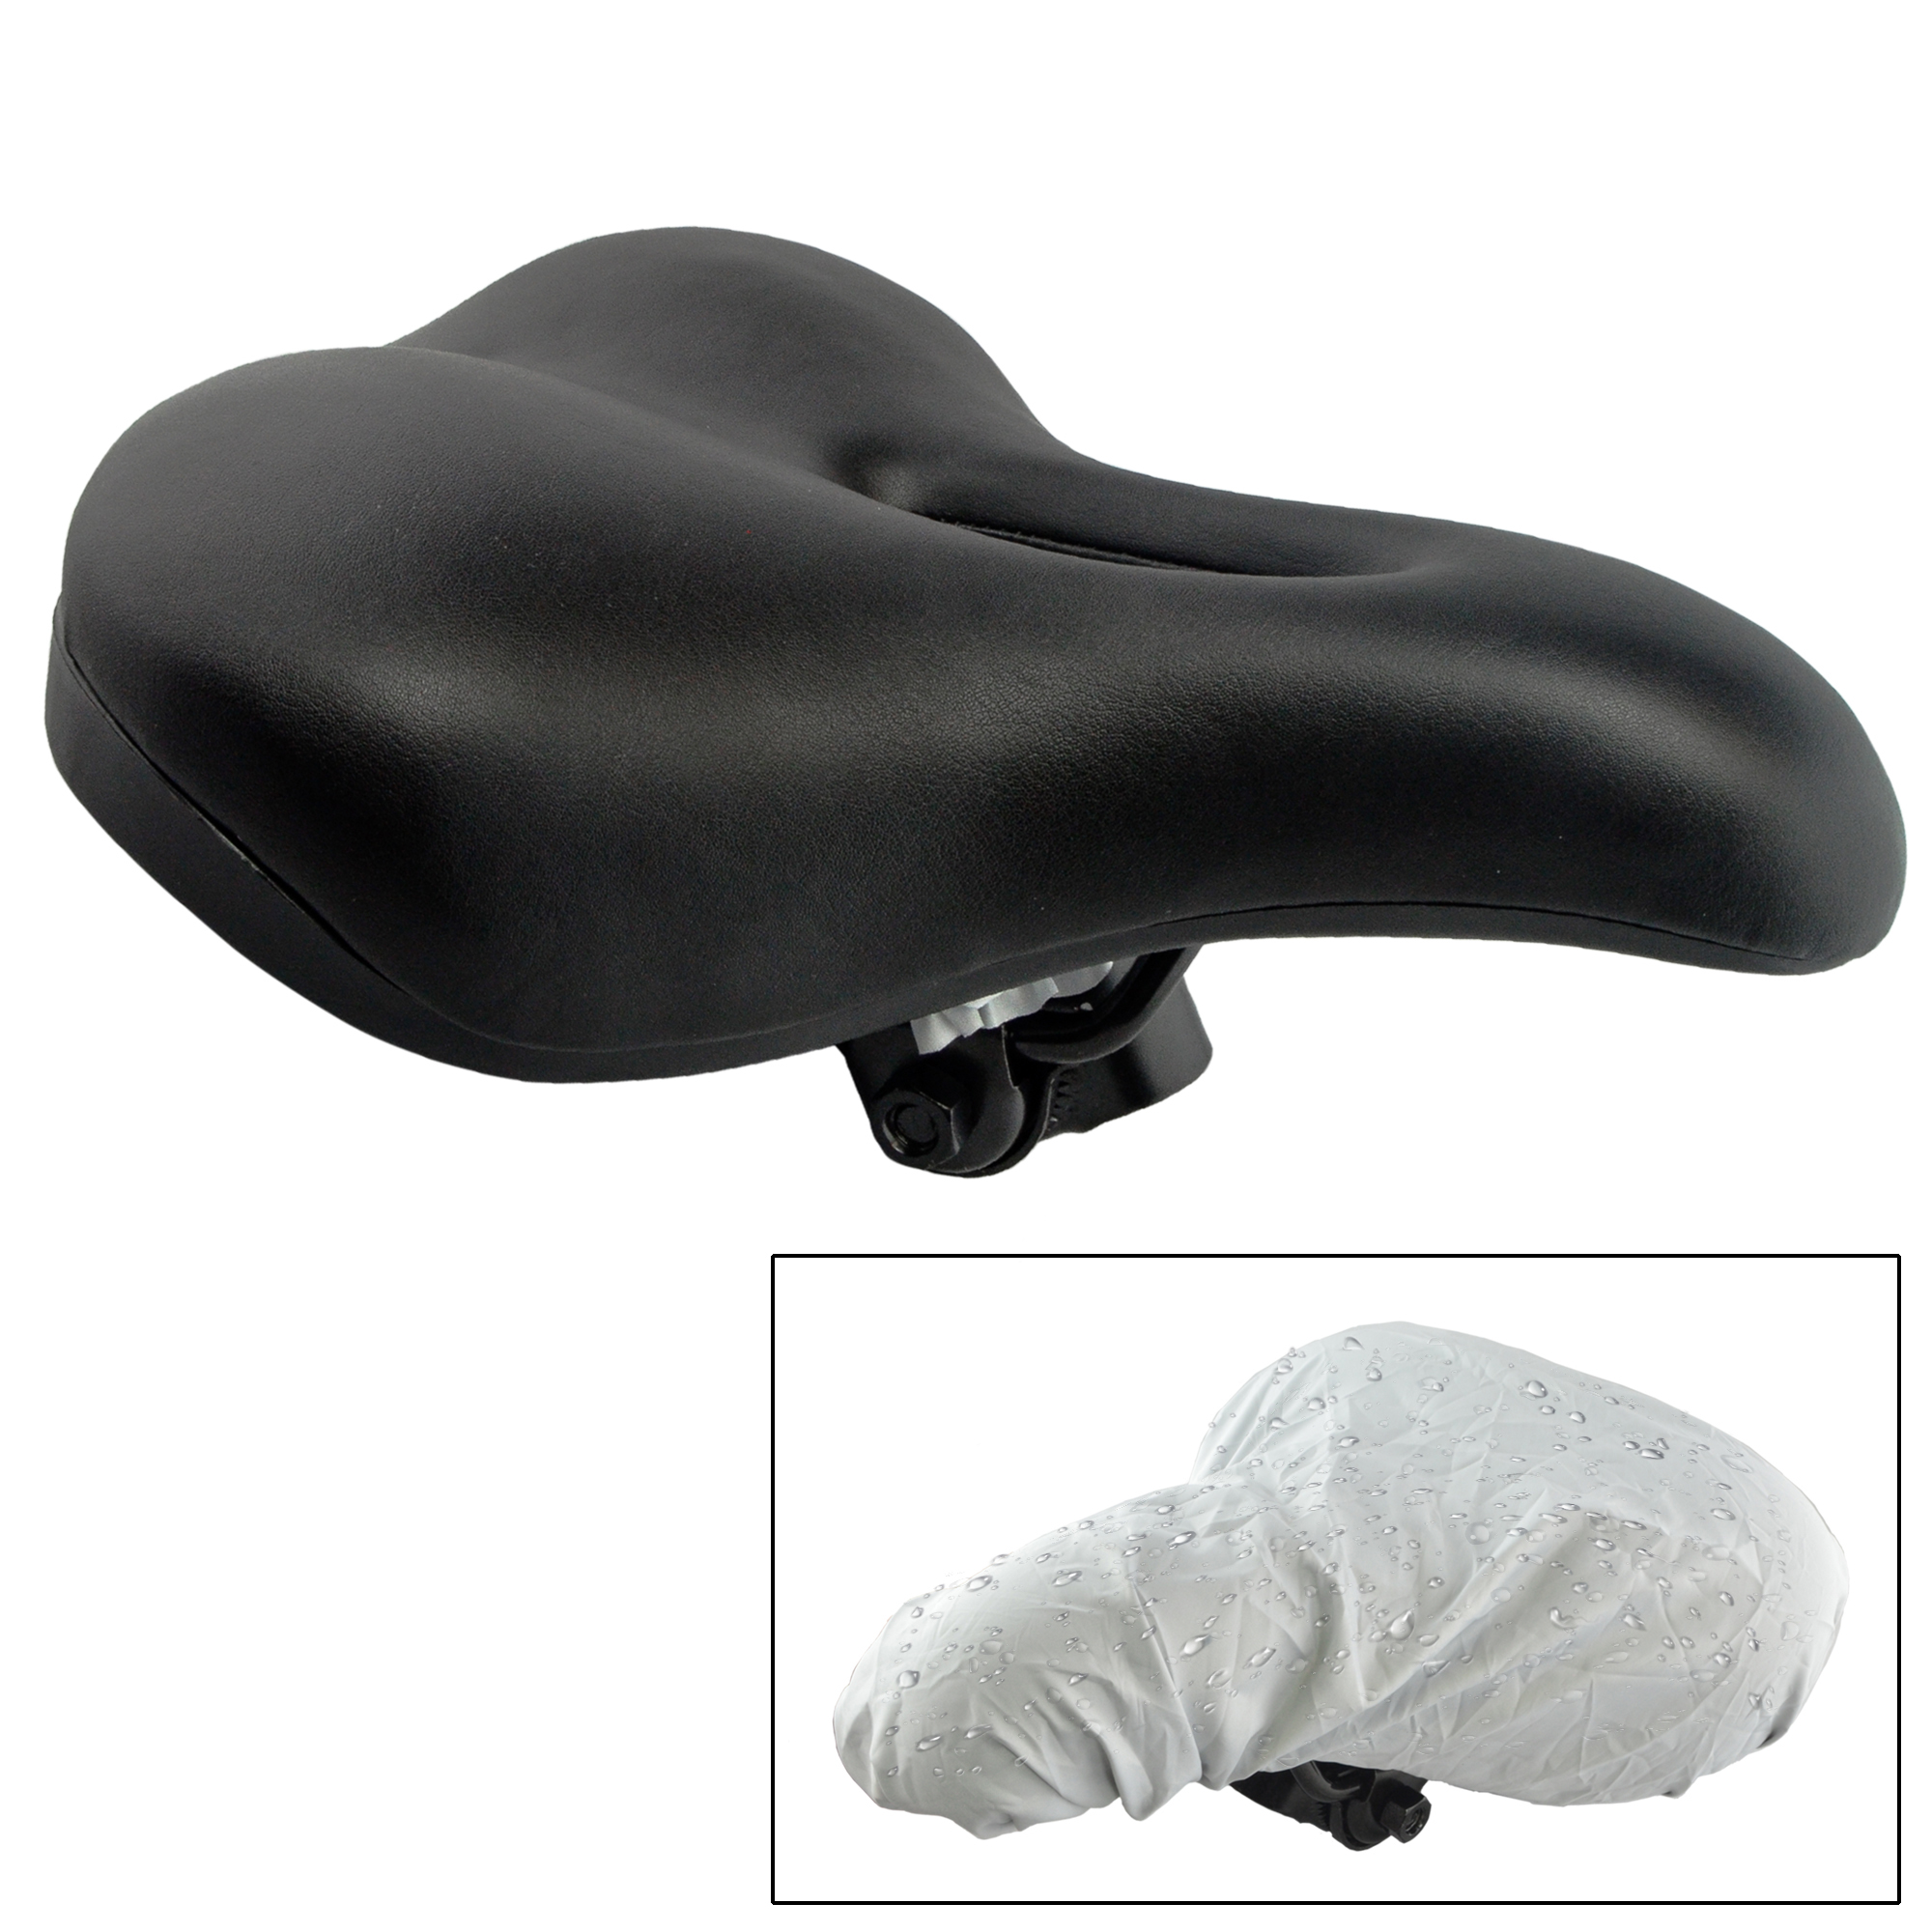 Lumintrail Comfort Gel Vented Bicycle Cruiser Saddle ...